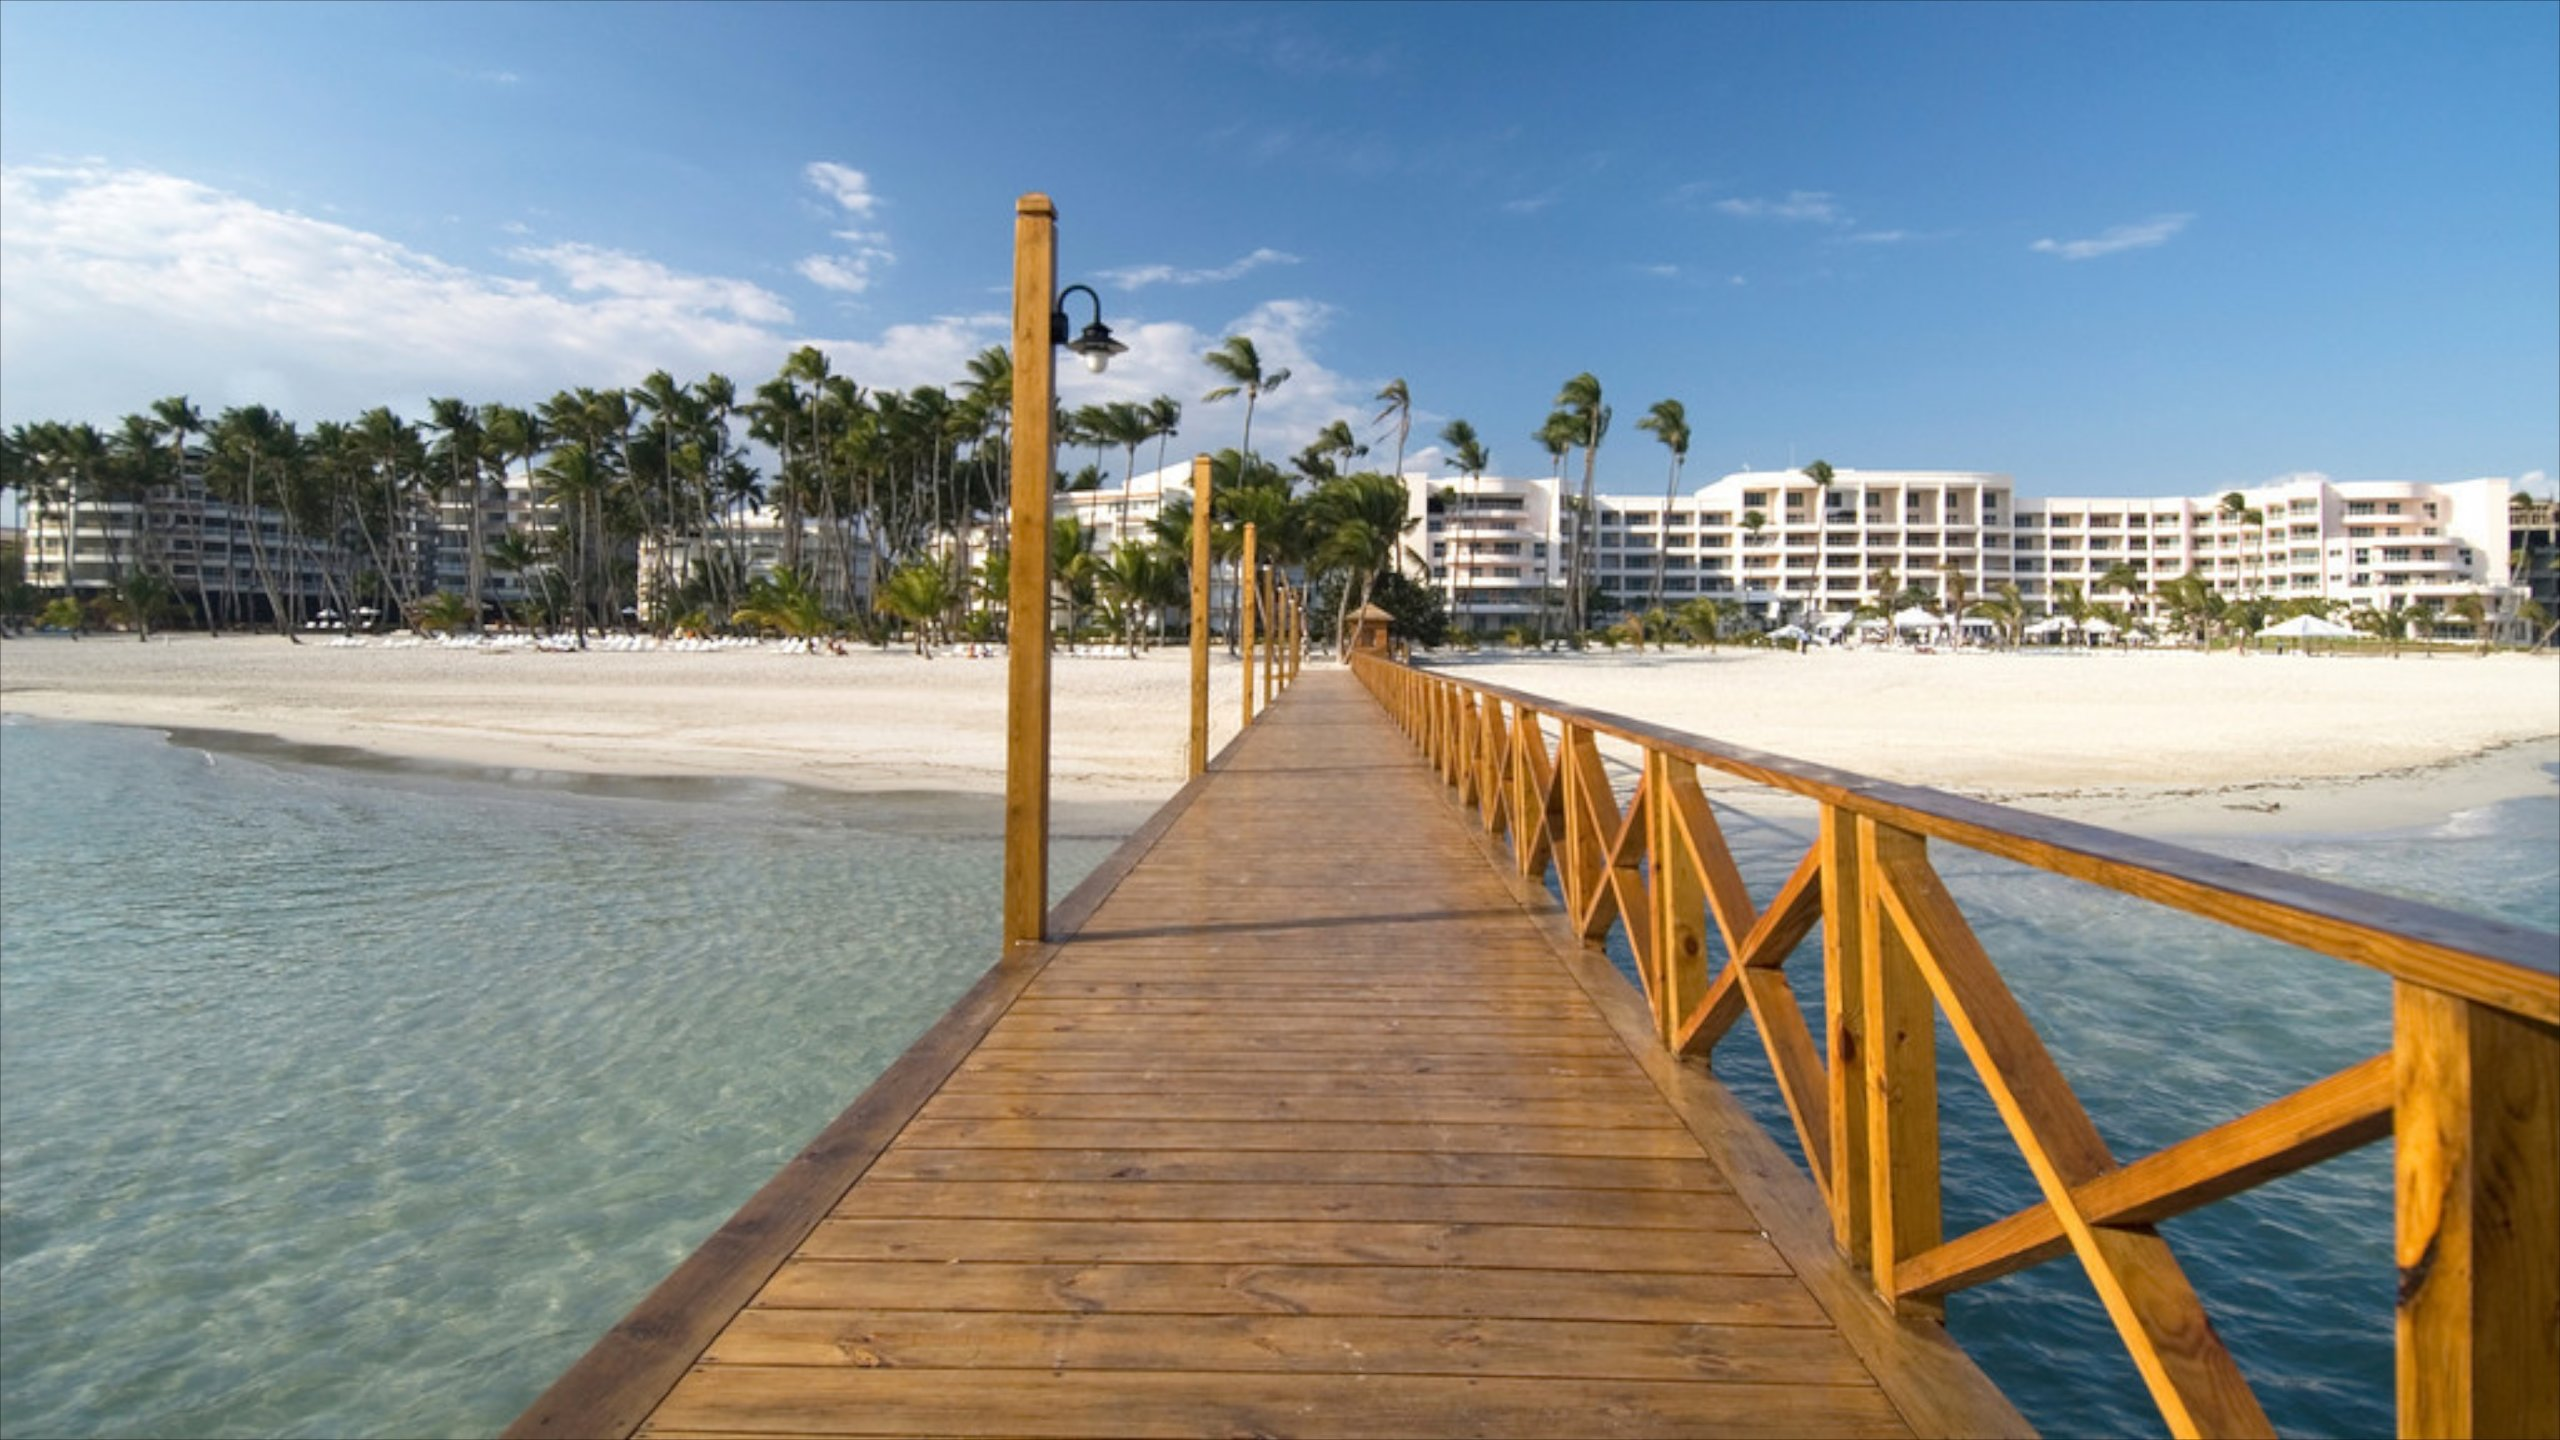 Juan Dolio, Guayacanes, San Pedro de Macoris, Dominican Republic